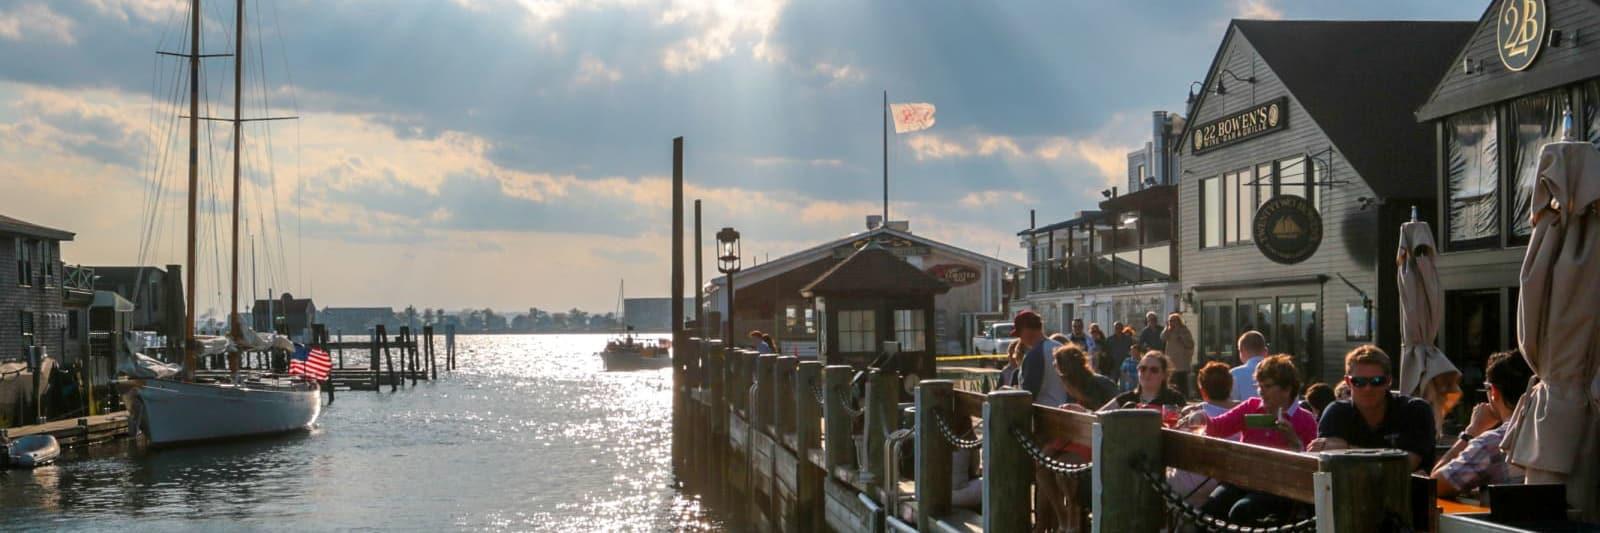 Bowen's-Wharf-w1600-w1600.jpg